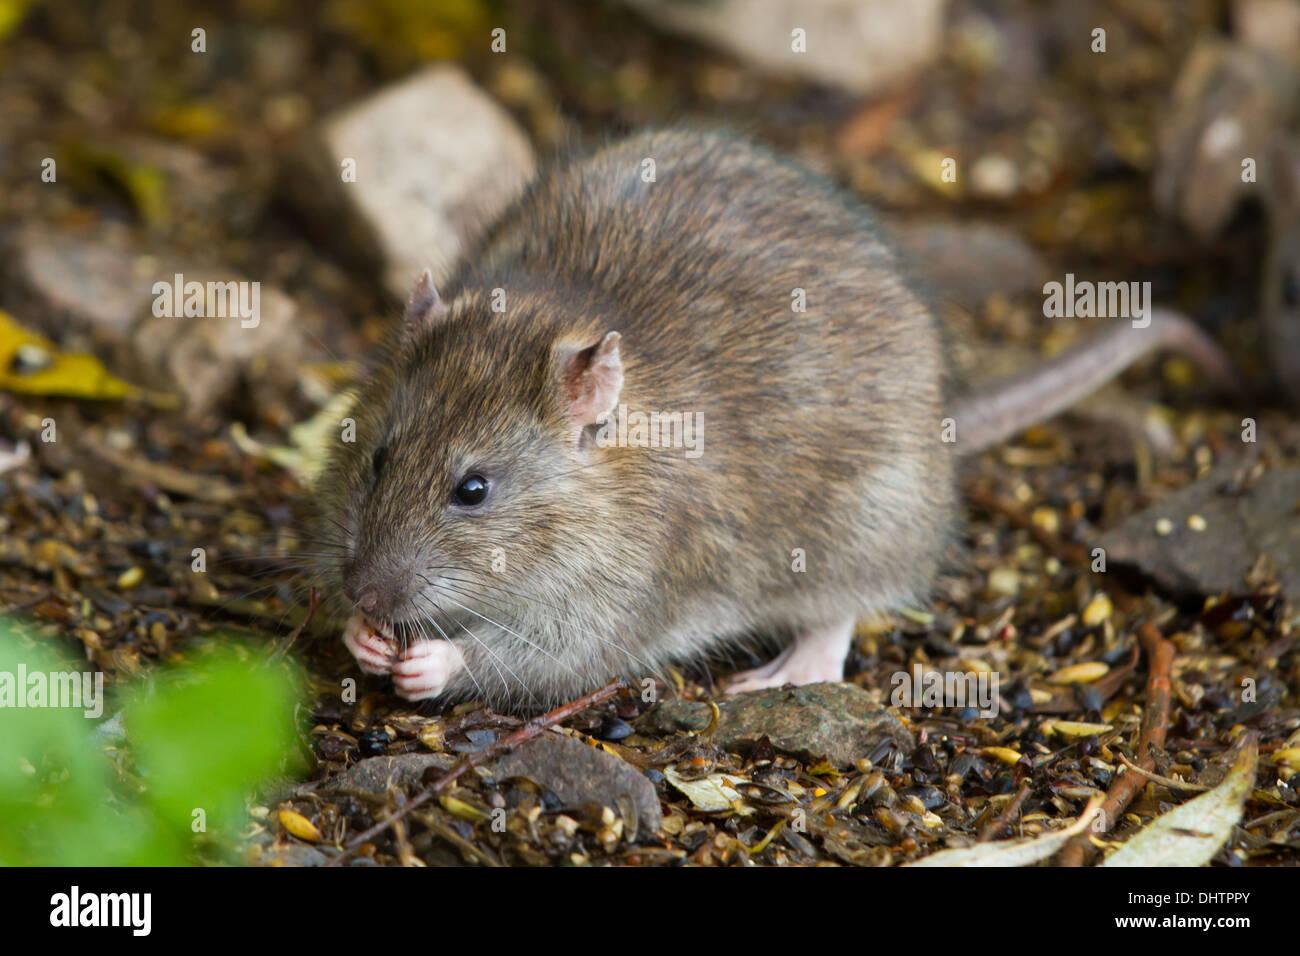 adult Brown Rat (Rattus norvegicus) feeding on spilt grain - Stock Image